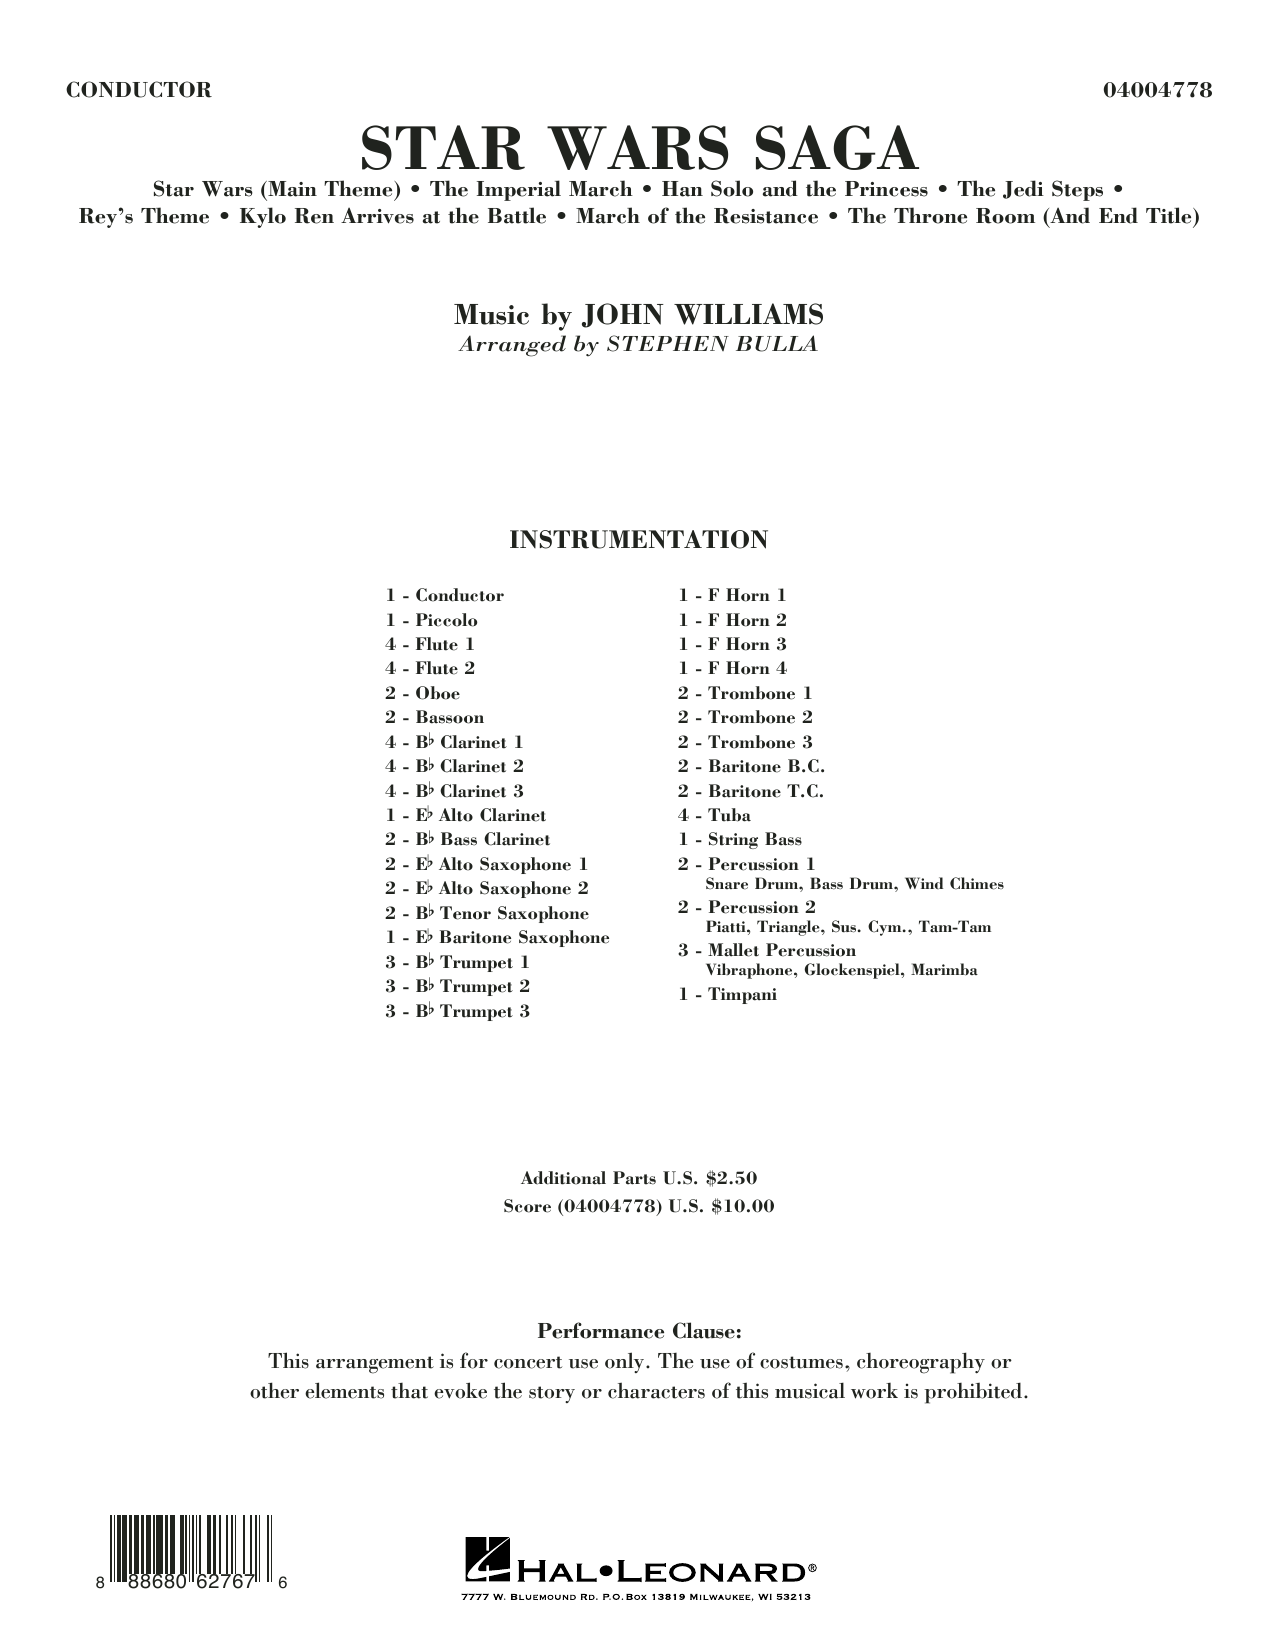 Star Wars Saga - Conductor Score (Full Score) Sheet Music